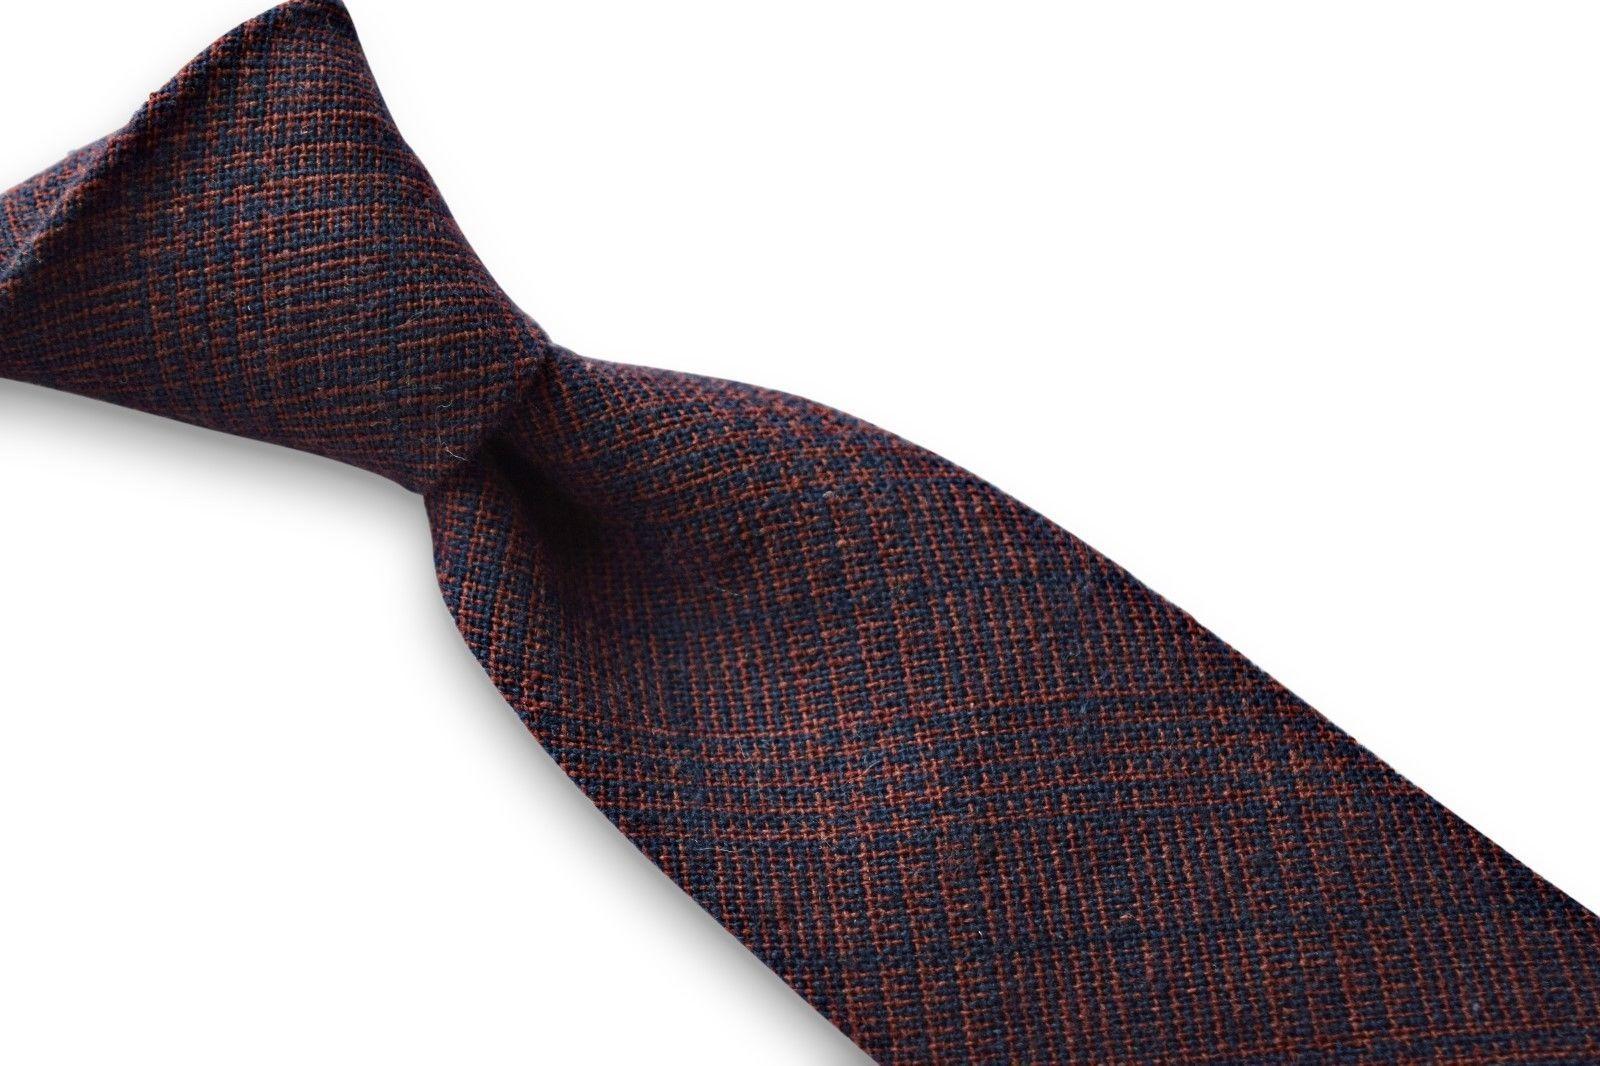 Frederick Thomas navy blue and orange check tweed wool men's tie FT3365